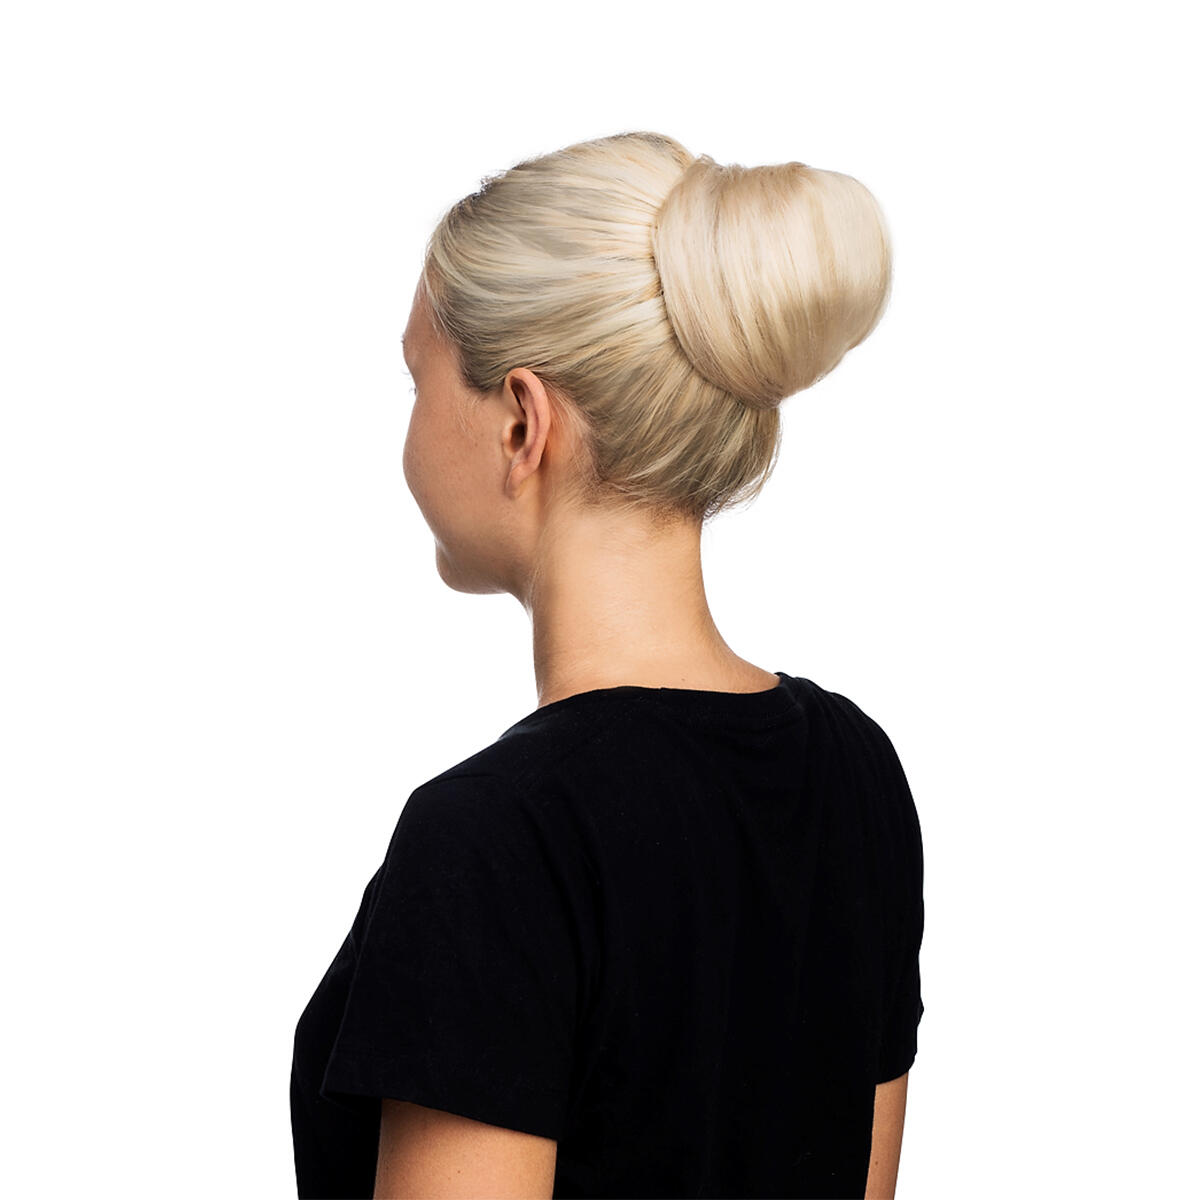 Volume Hair Scrunchie 40 G Scrunchie with real hair 1.2 Black Brown